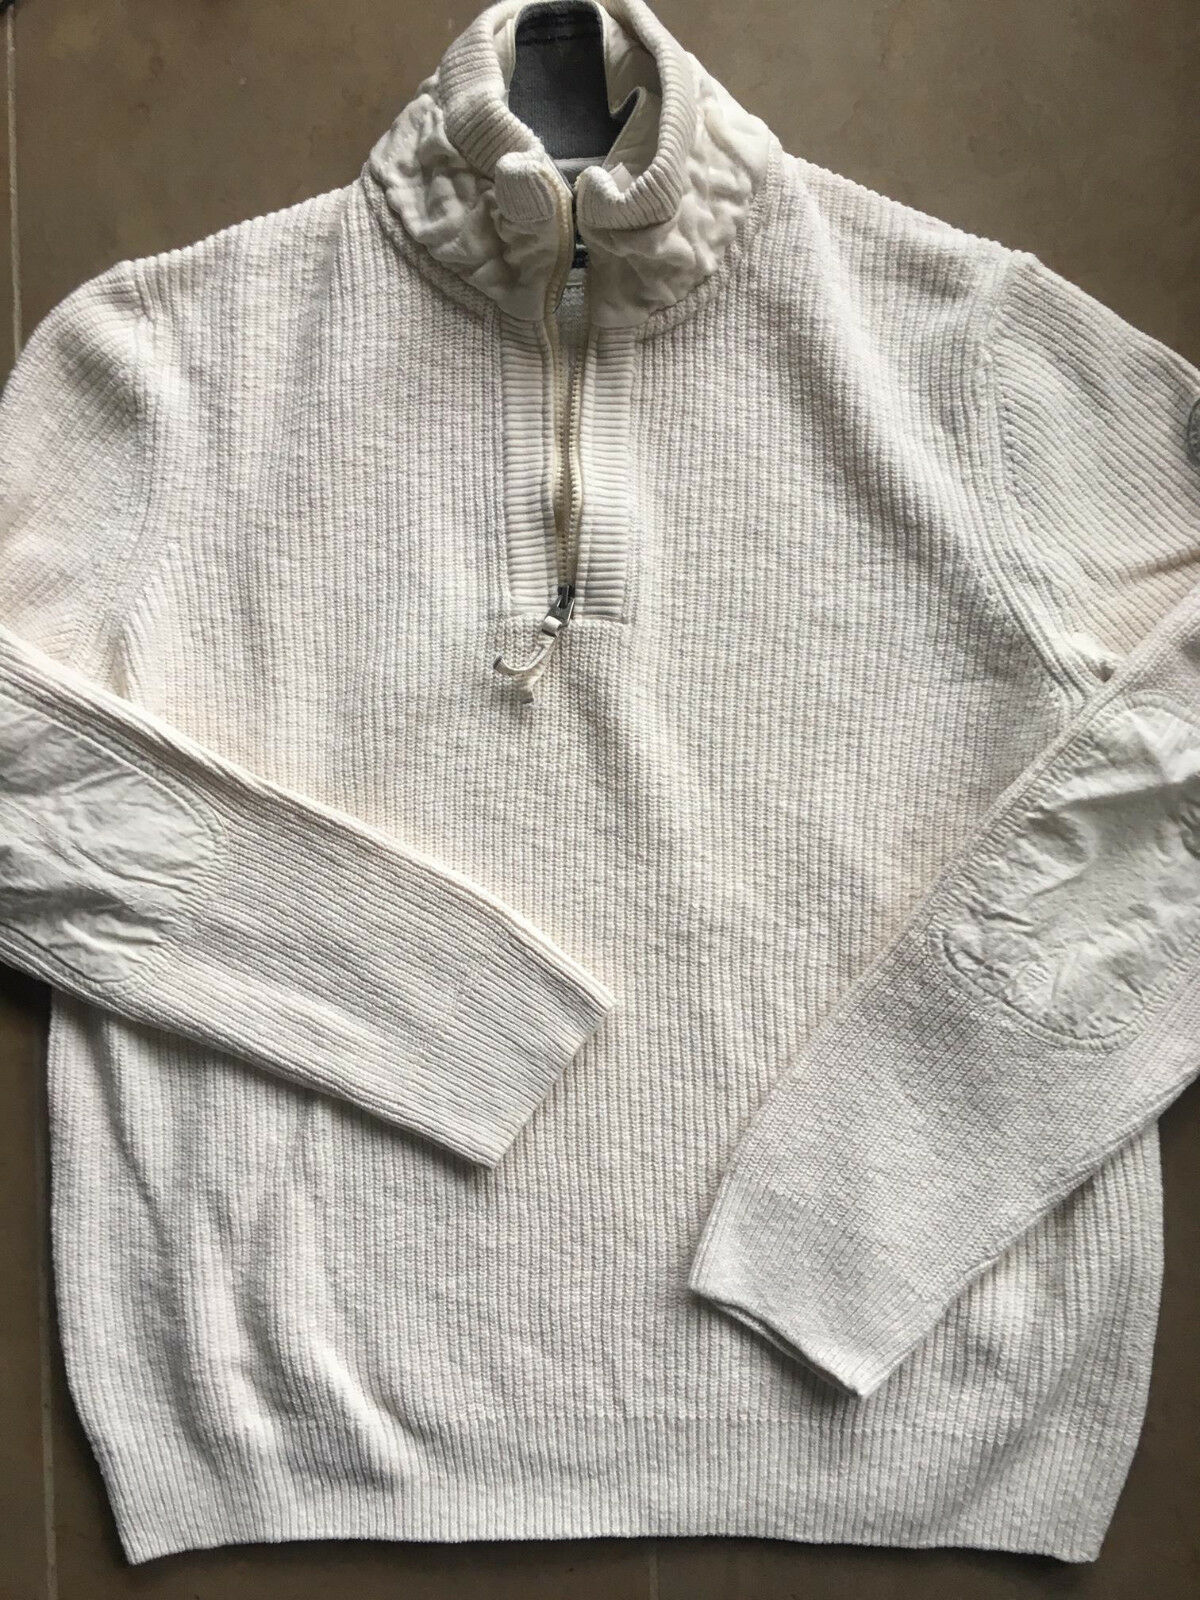 Marc O' Polo Pullover Herrenpullover Gr.XL 54 weiß hochwertig fast neu Baumwolle